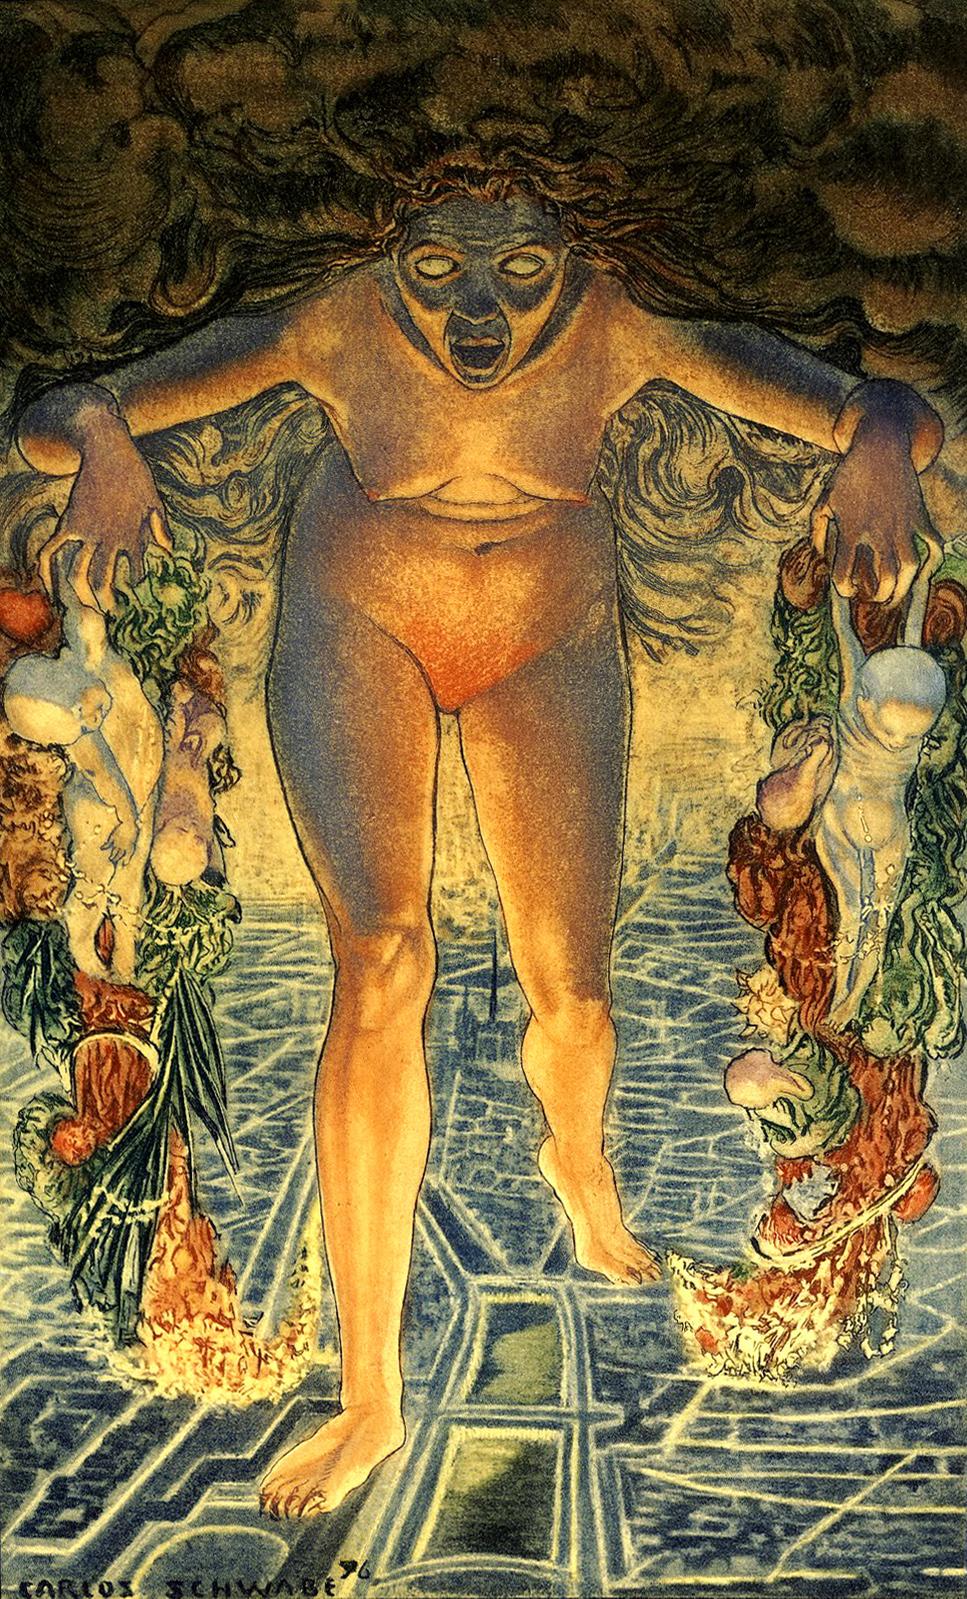 Carlos Schwabe - Le Crepuscule du soir Fleurs du Mal Dawn, 1900